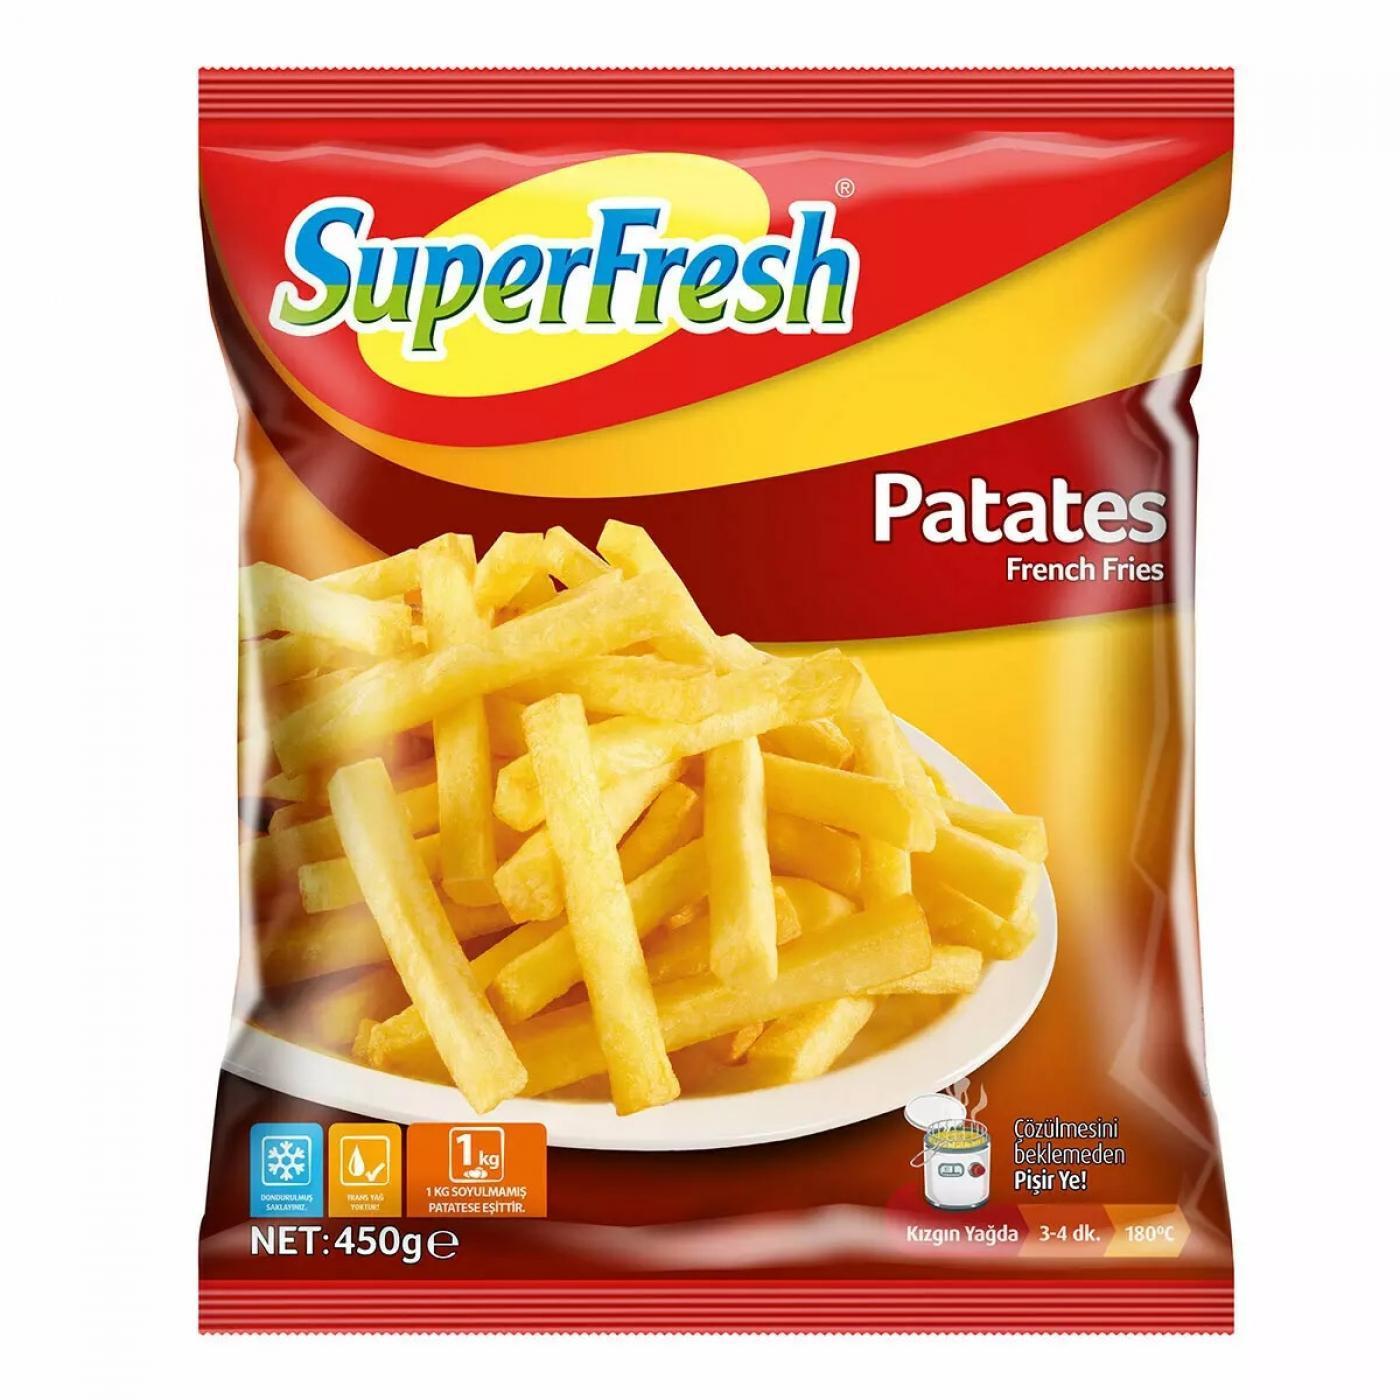 SUPERFRESH PATATES 450GR